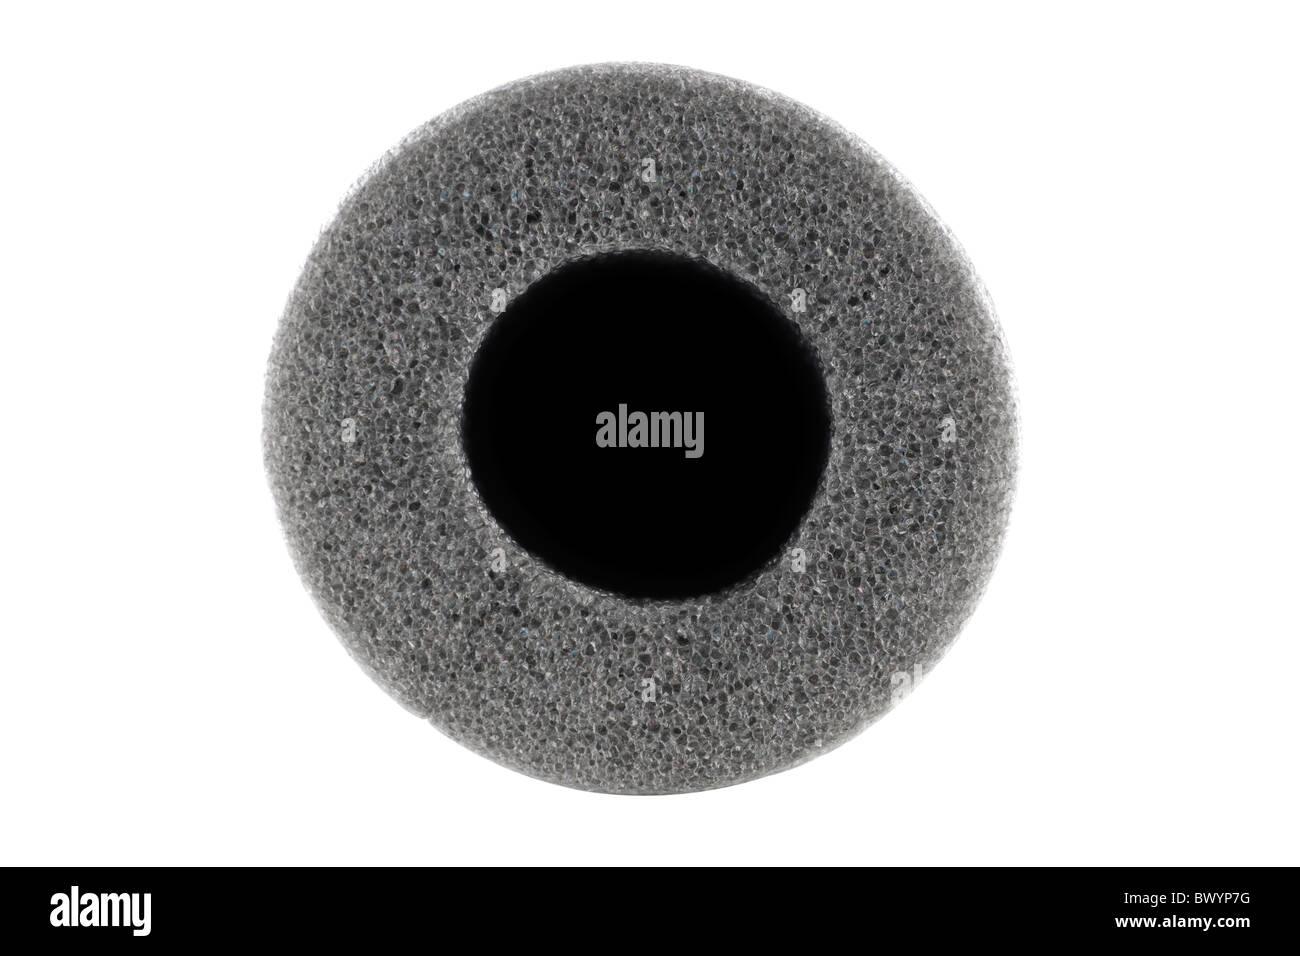 Grey polyethylene sponge foam - Stock Image